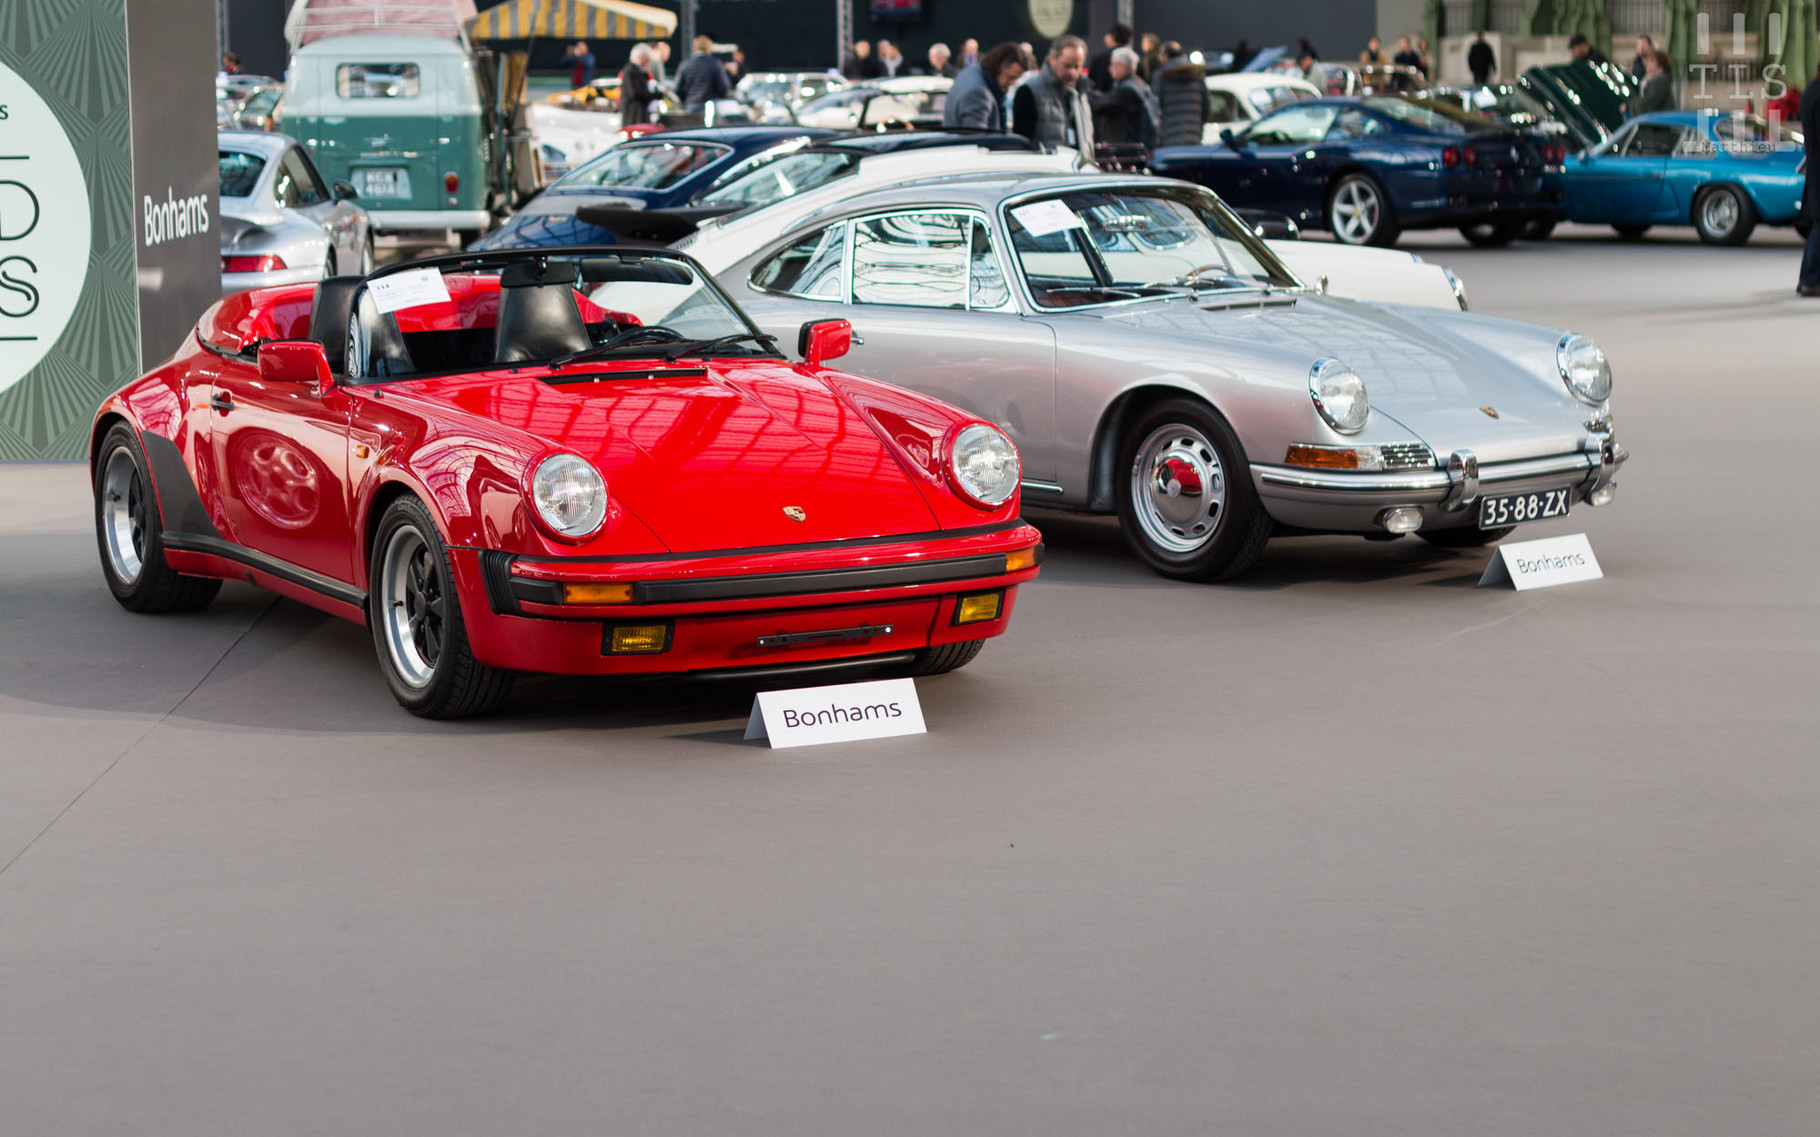 Porsche 911 Speedster, vendue à 251 666 euros.